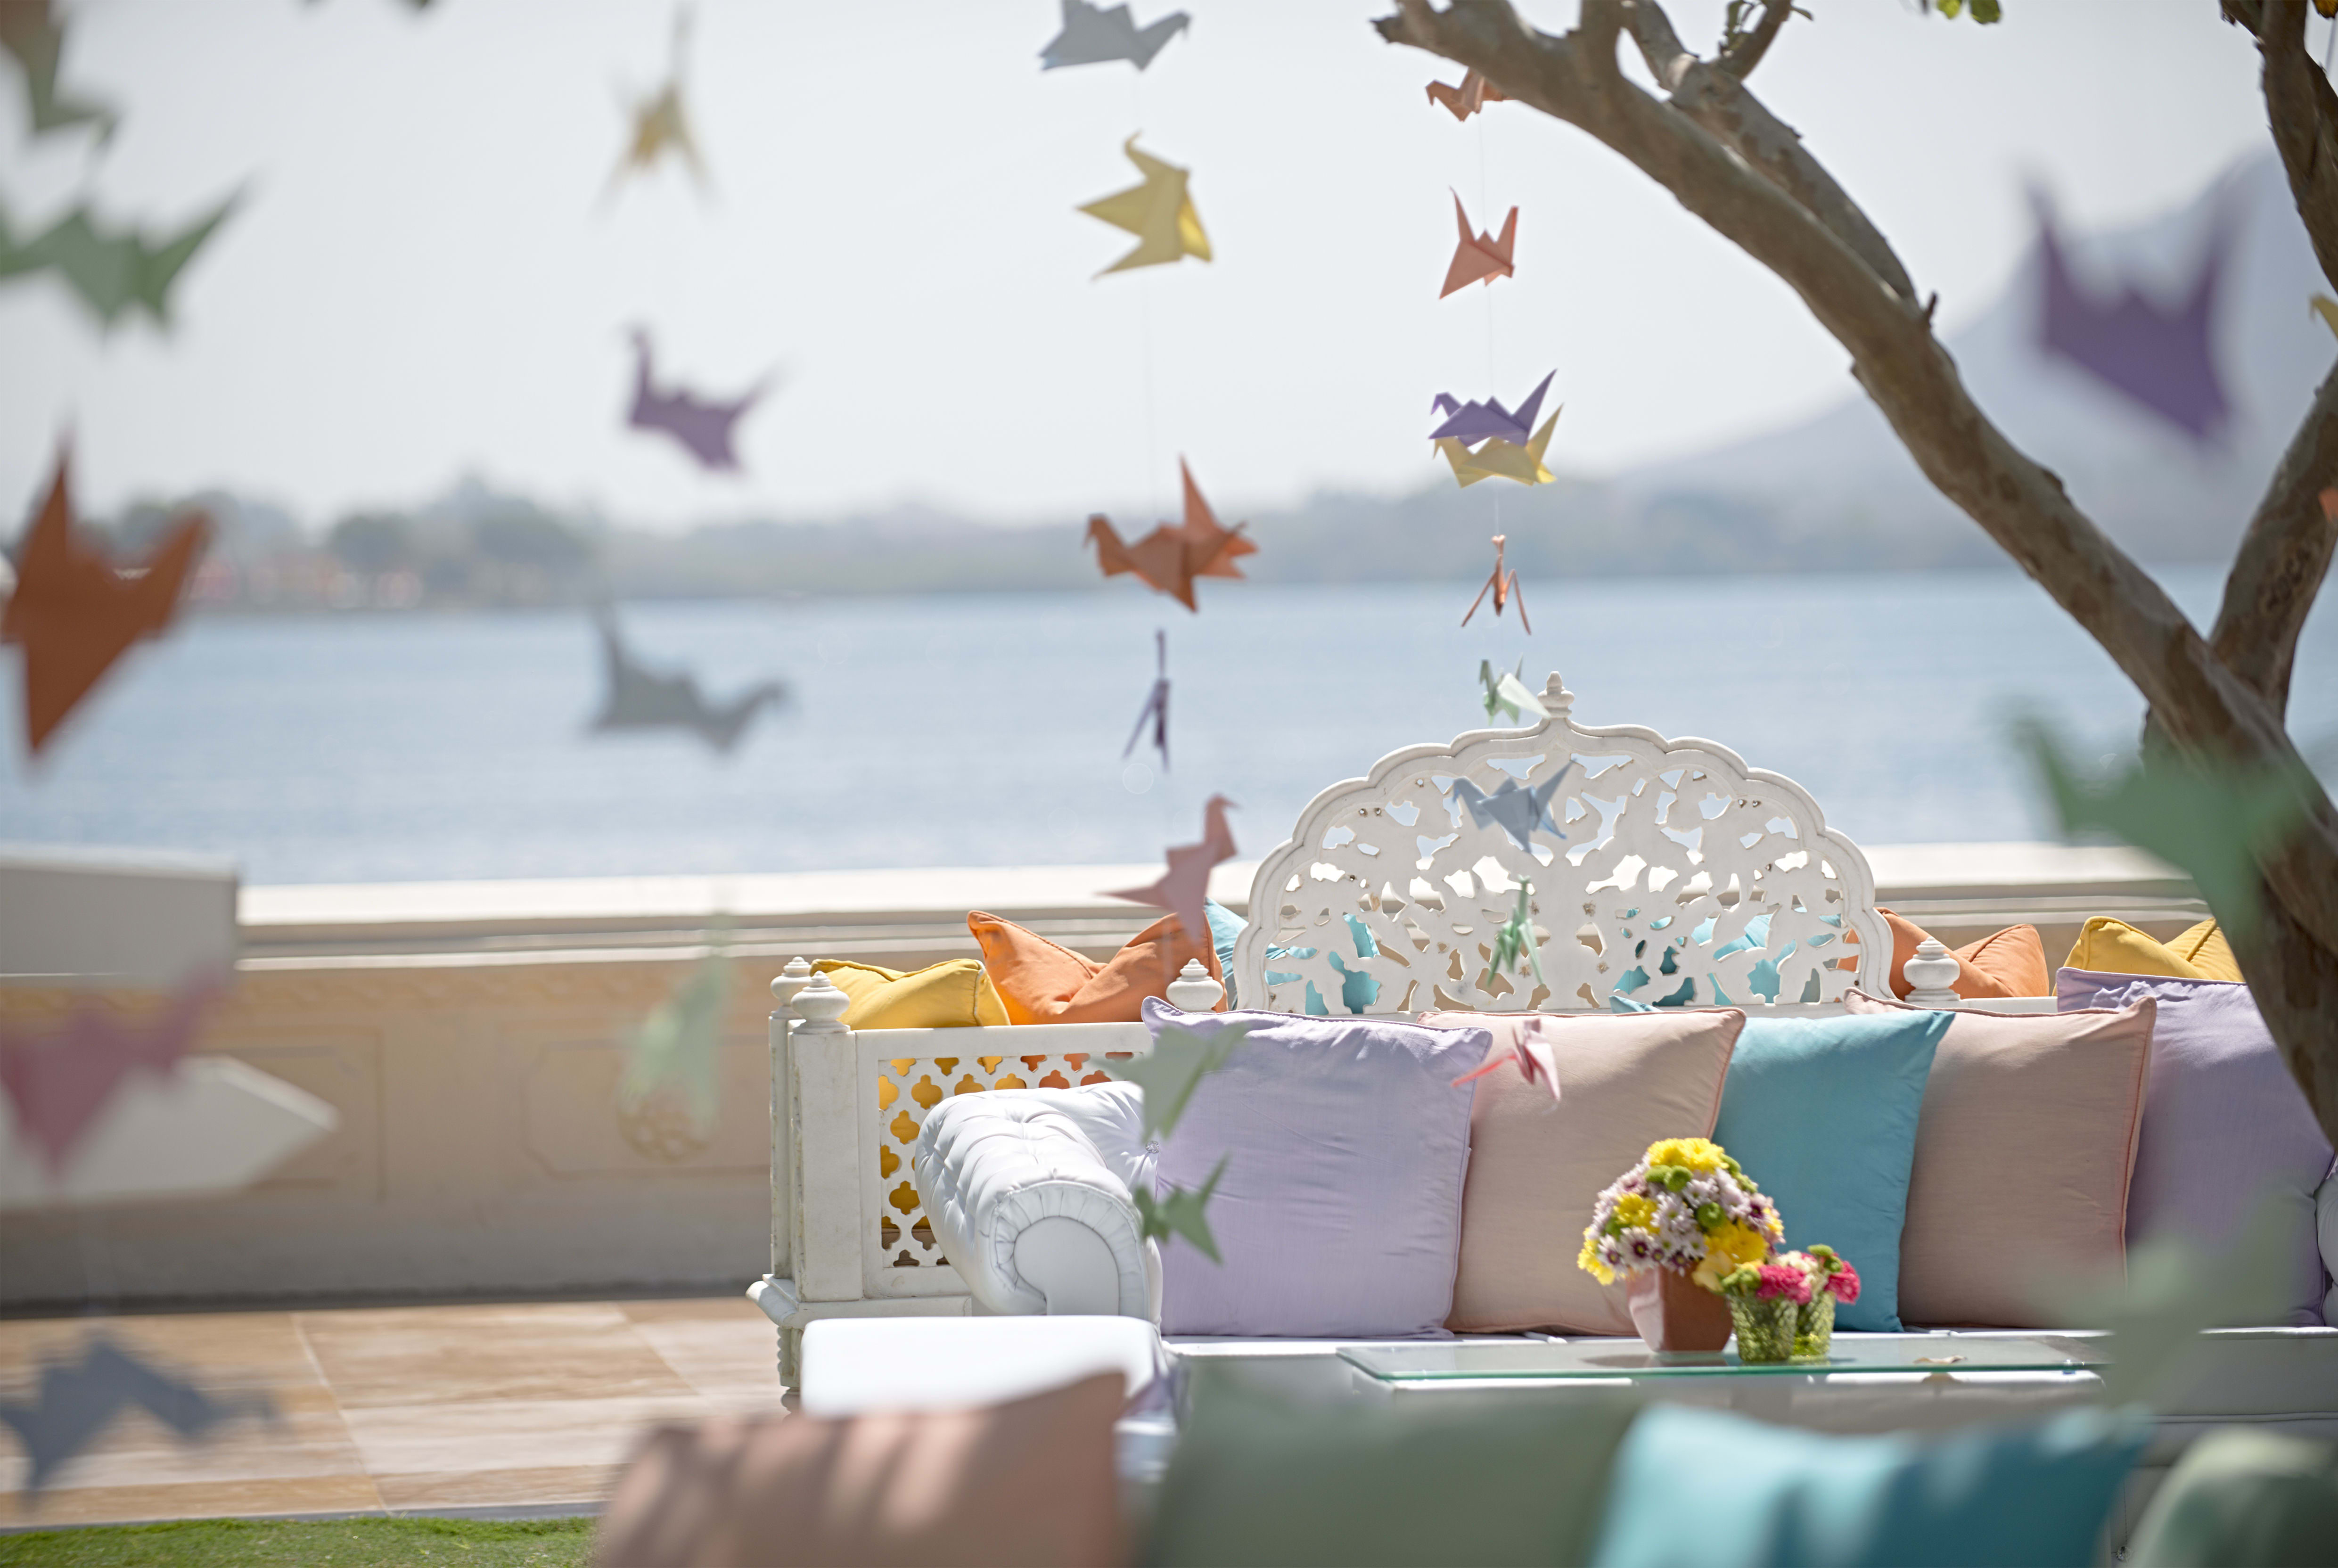 fairytale decoration!:tribhovandas bhimji zaveri ltd., namrata soni makup artist